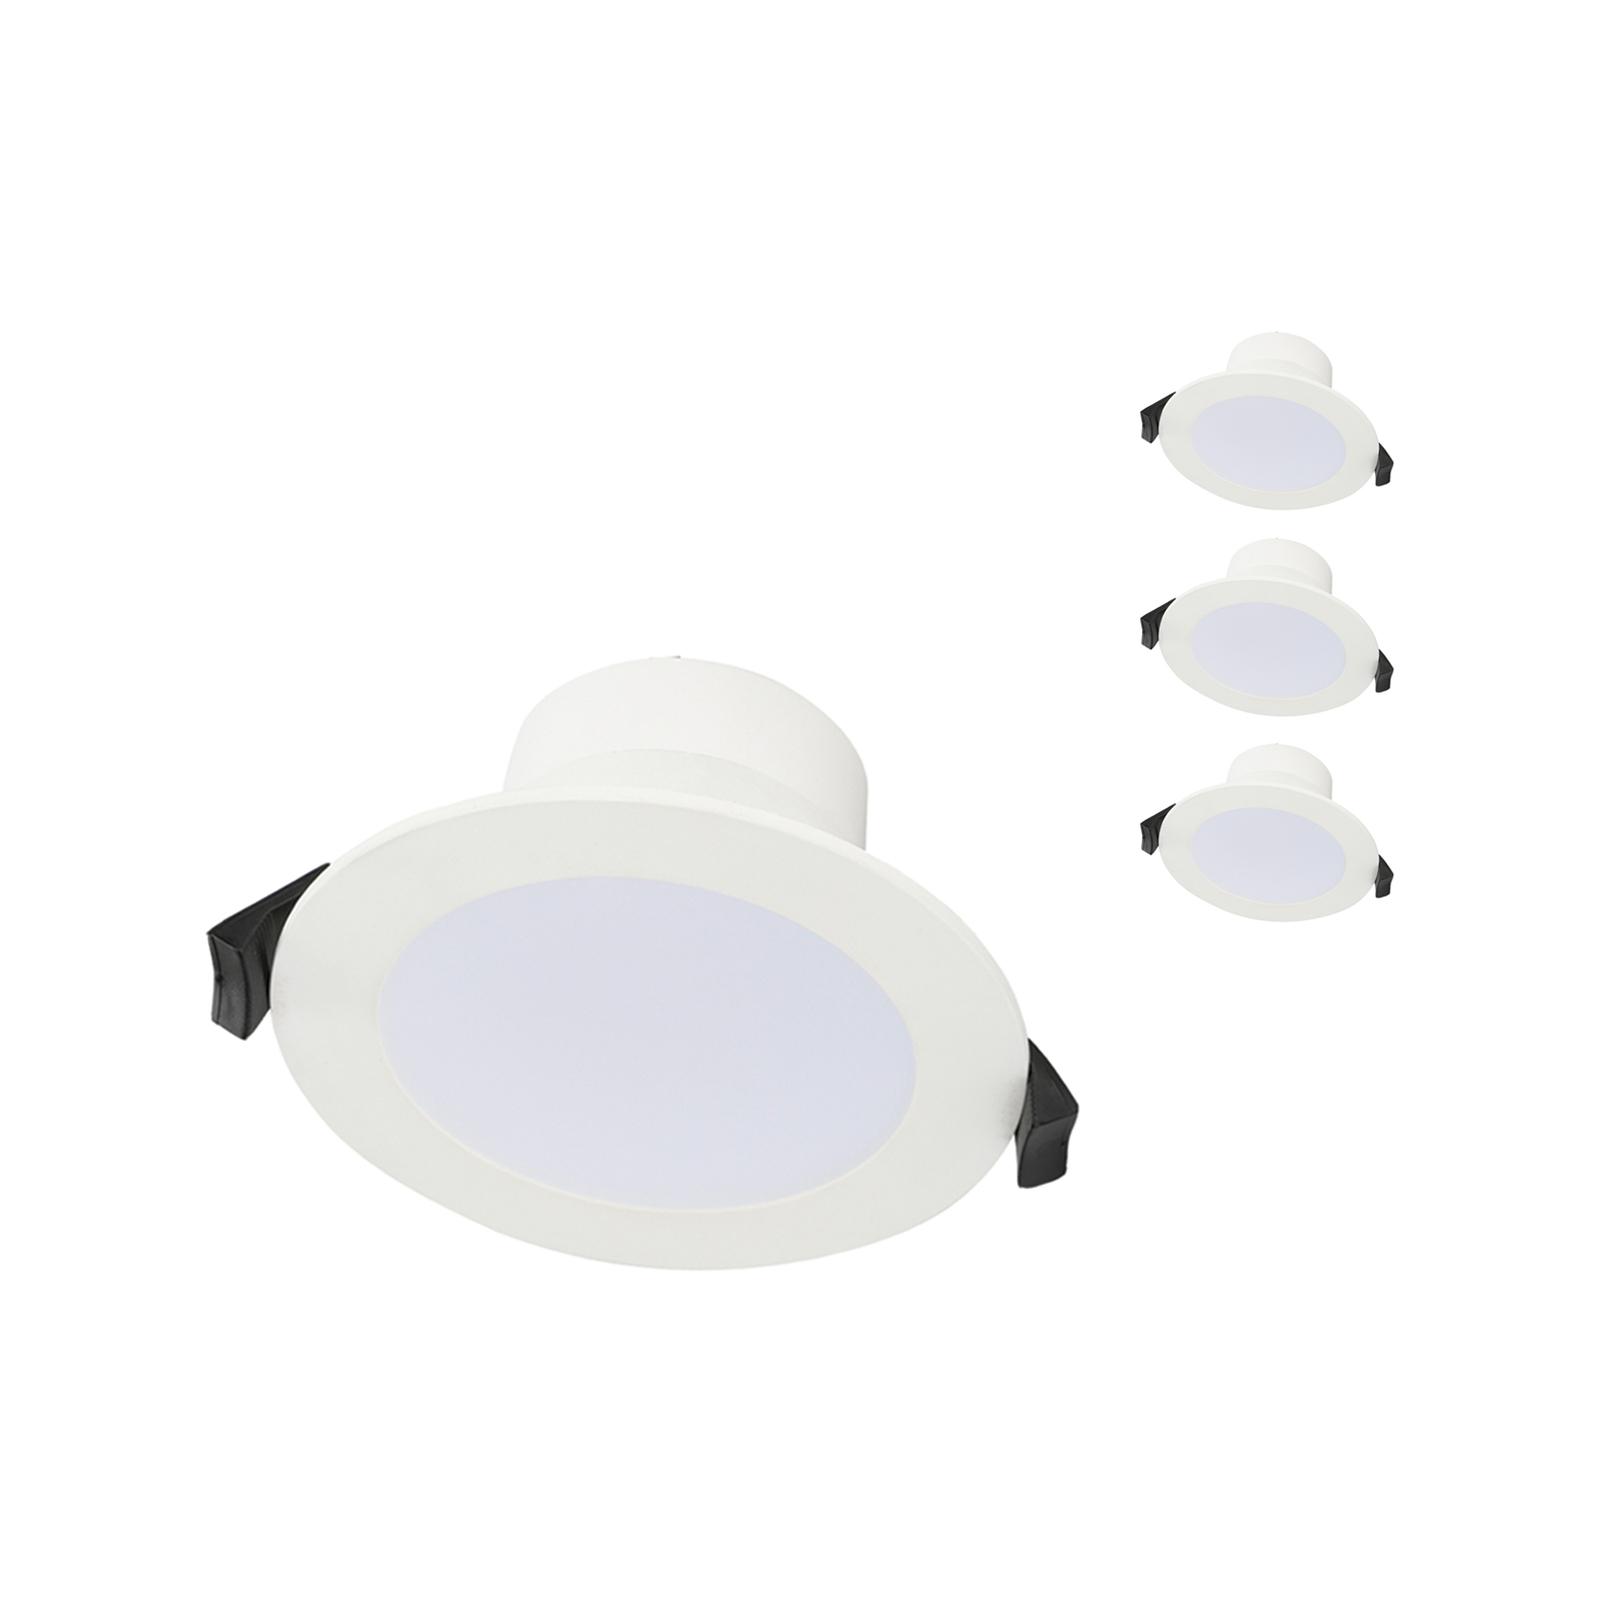 Luce Bella 5W 70mm Tri-CCT LED Downlight - 4 Pack